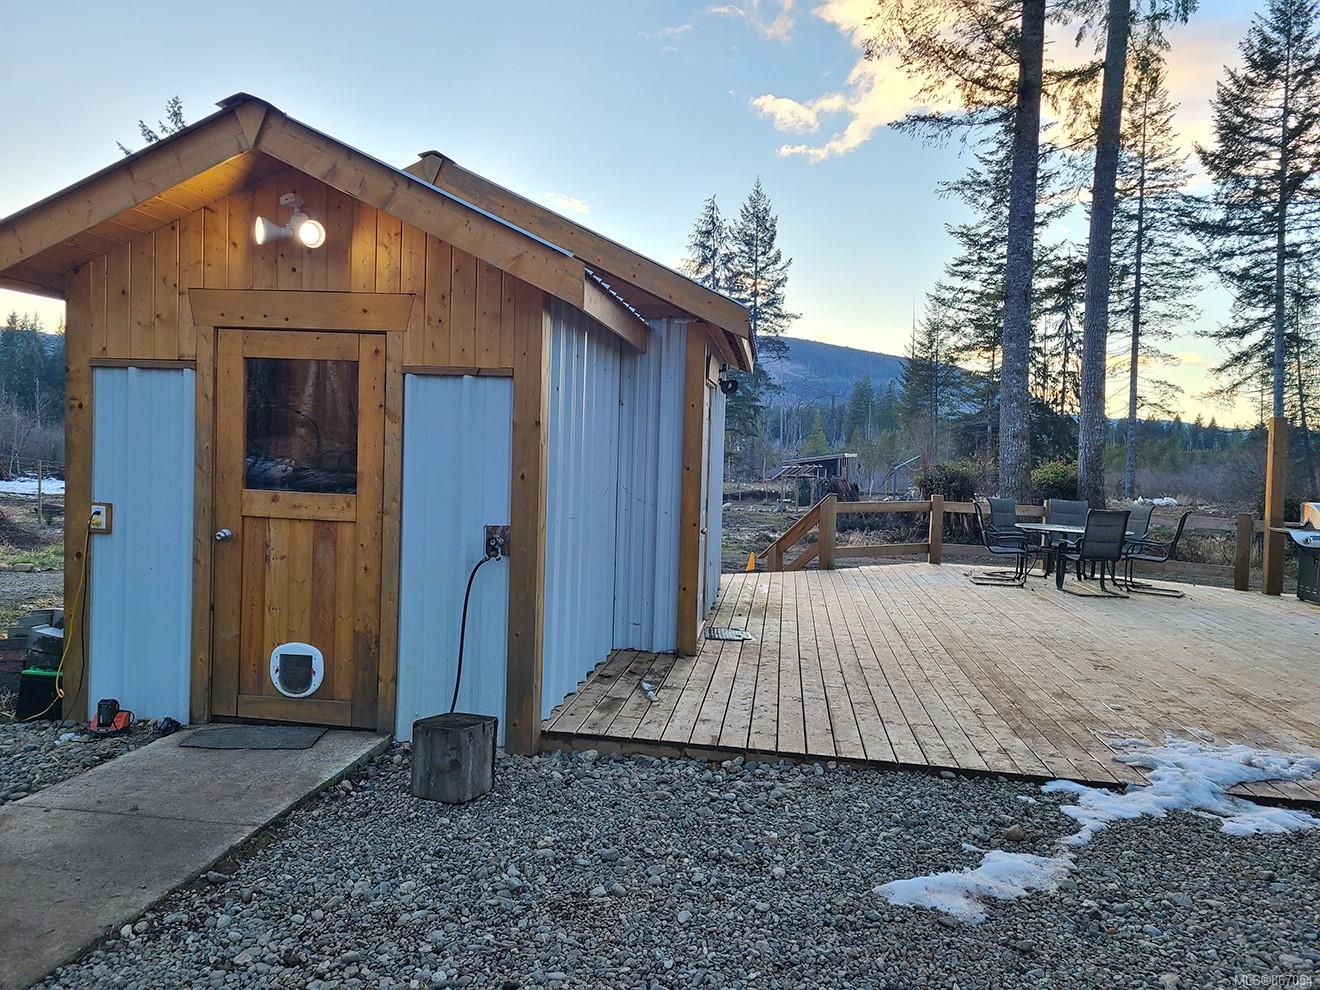 Photo 19: Photos: 2056 Spike Rd in : CV Merville Black Creek House for sale (Comox Valley)  : MLS®# 867054